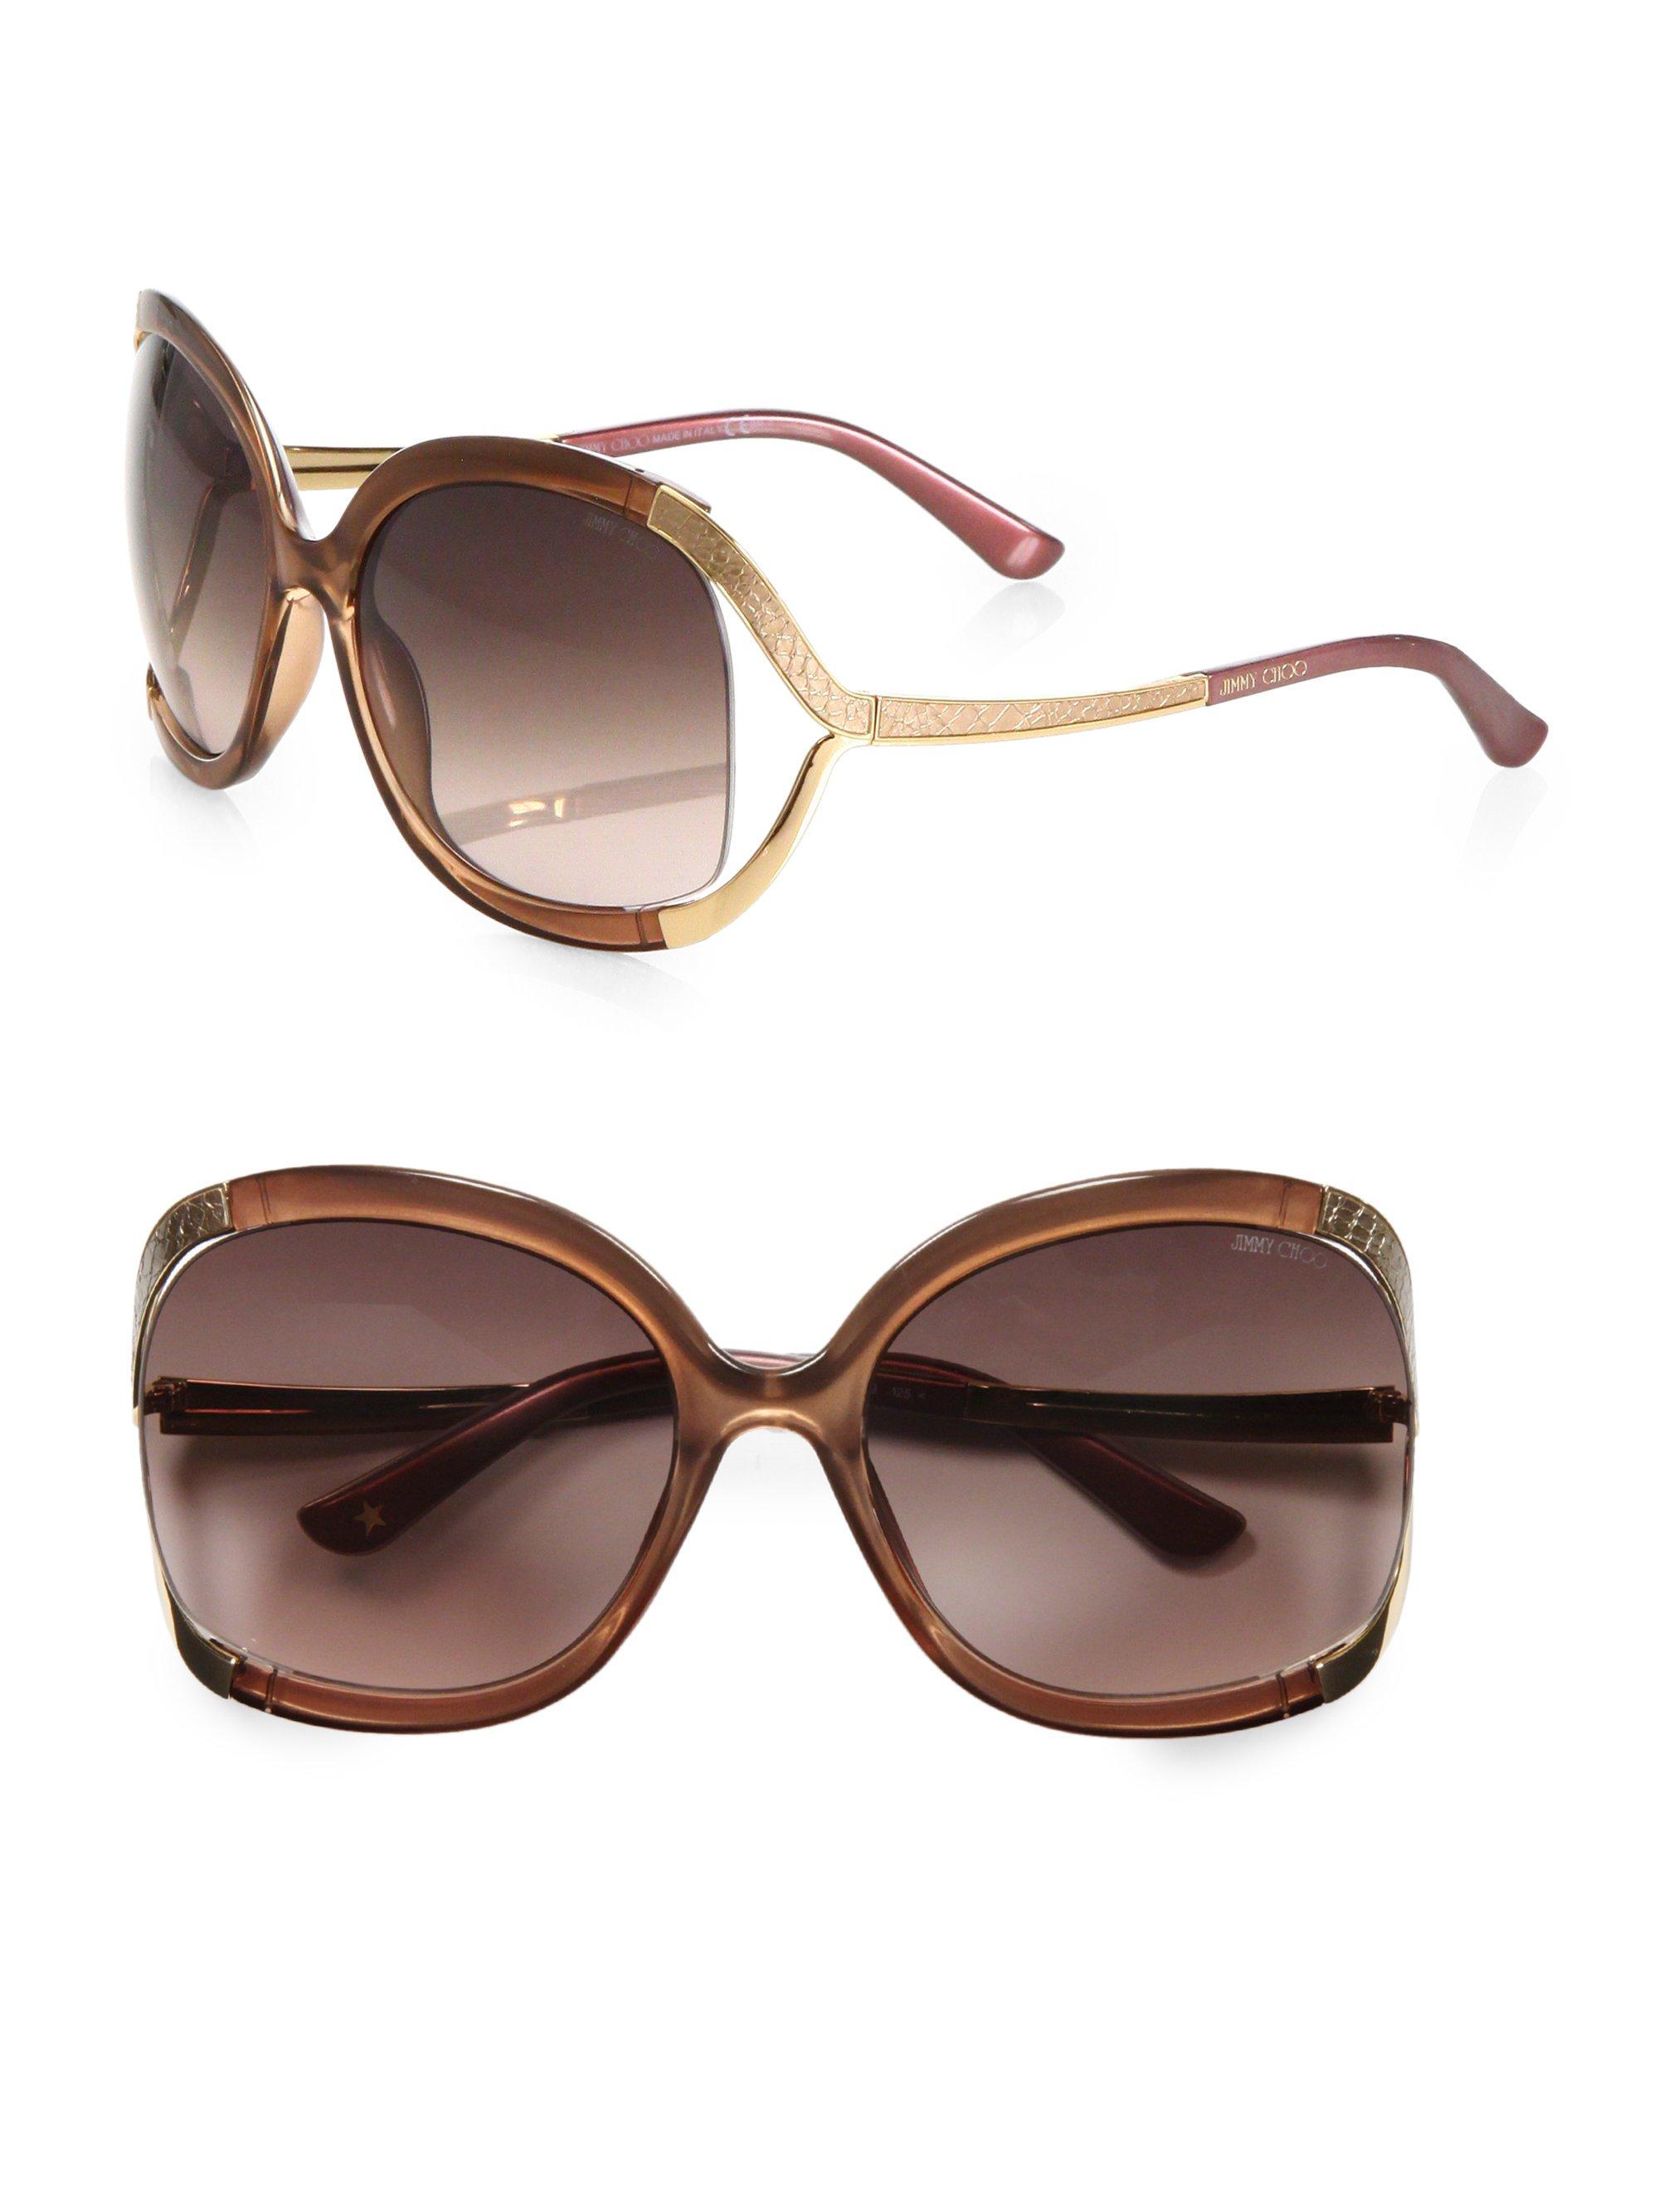 22b061766353 Jimmy Choo Beatrix Square Sunglasses in Brown - Lyst